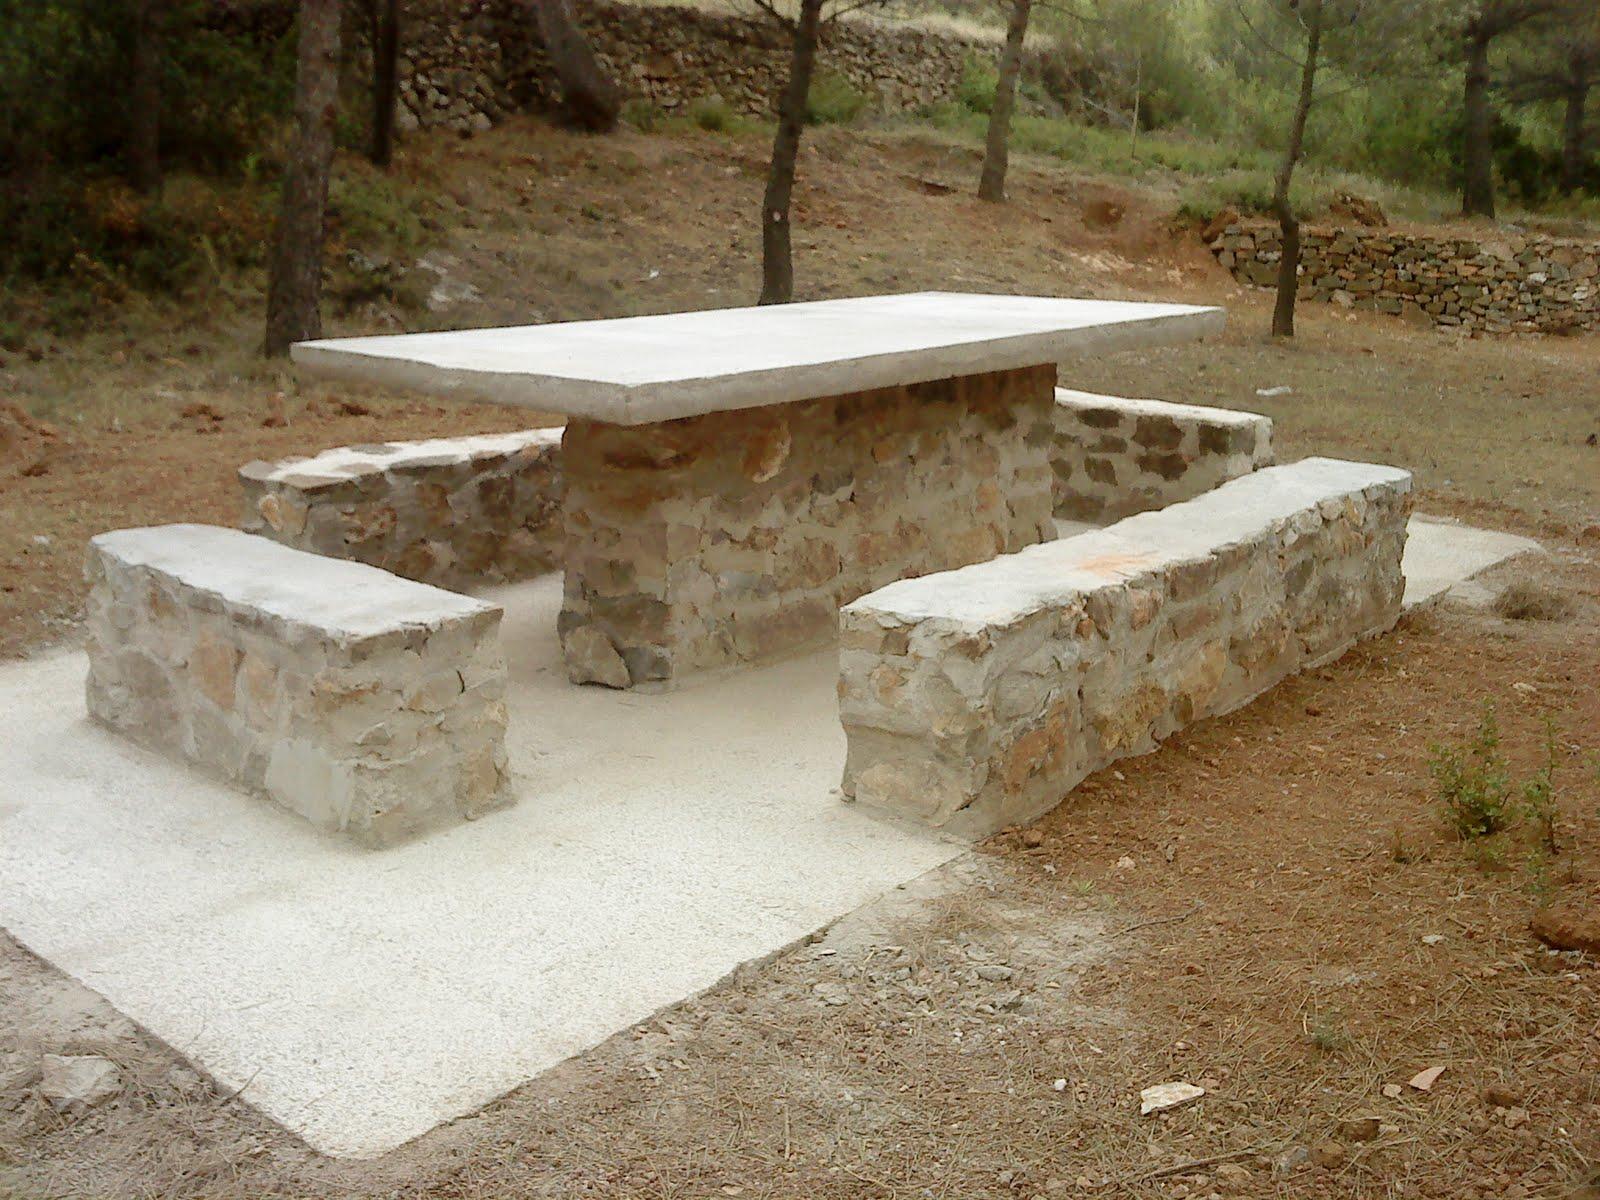 Taller de empleo alba iler a de piedra en seco de - Mesas de piedra para exterior ...